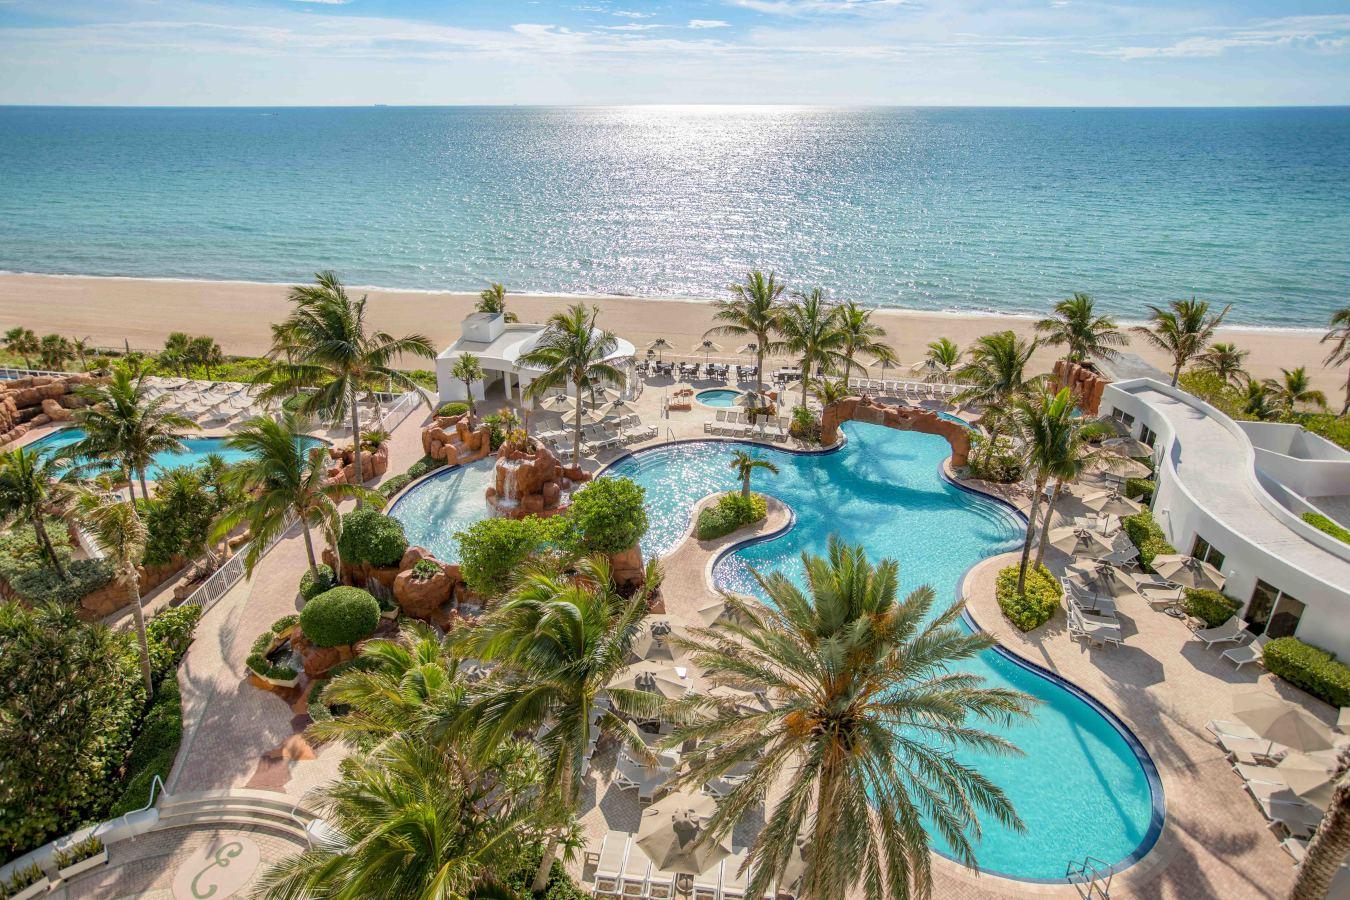 The beach at Trump International Beach Resort